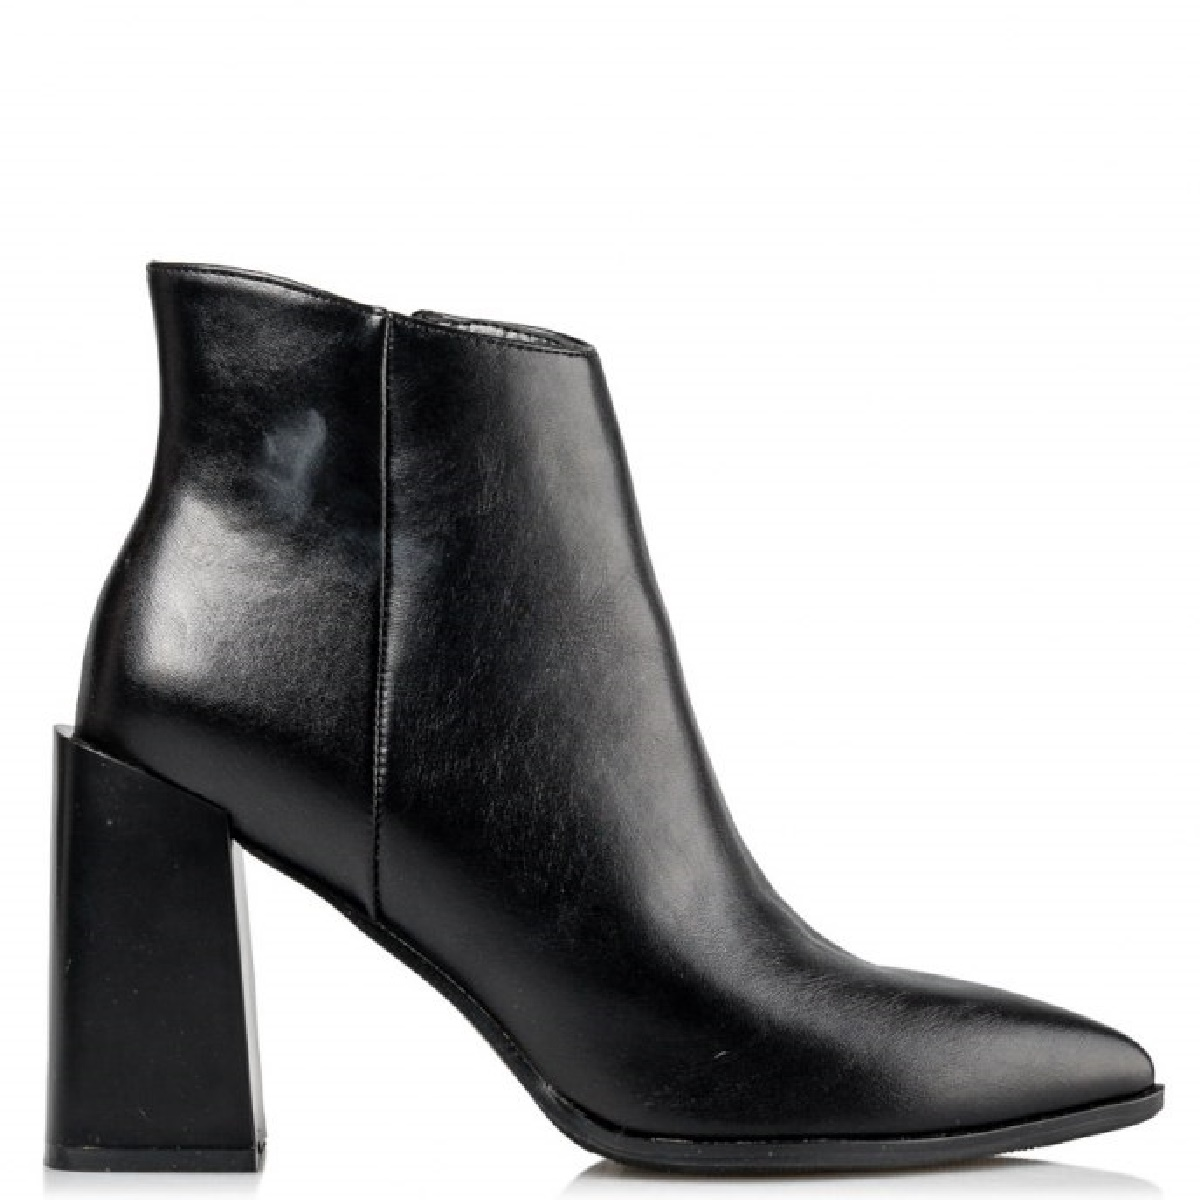 BLOCK HEEL BOOTIES Miss NV μποτάκια V45-14172-34 Μαύρο